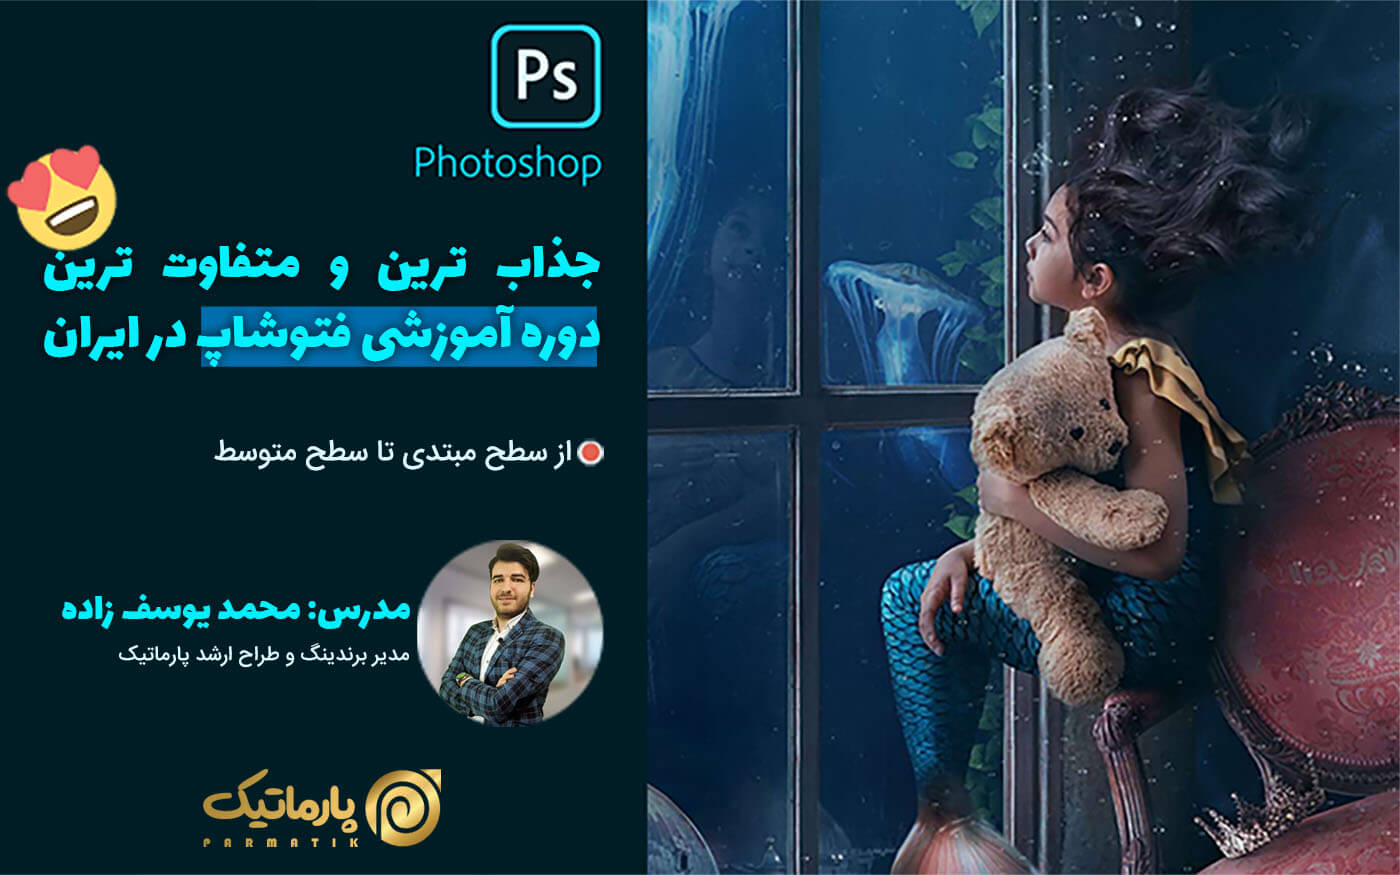 آموزش مقدماتی فوتو شاپ